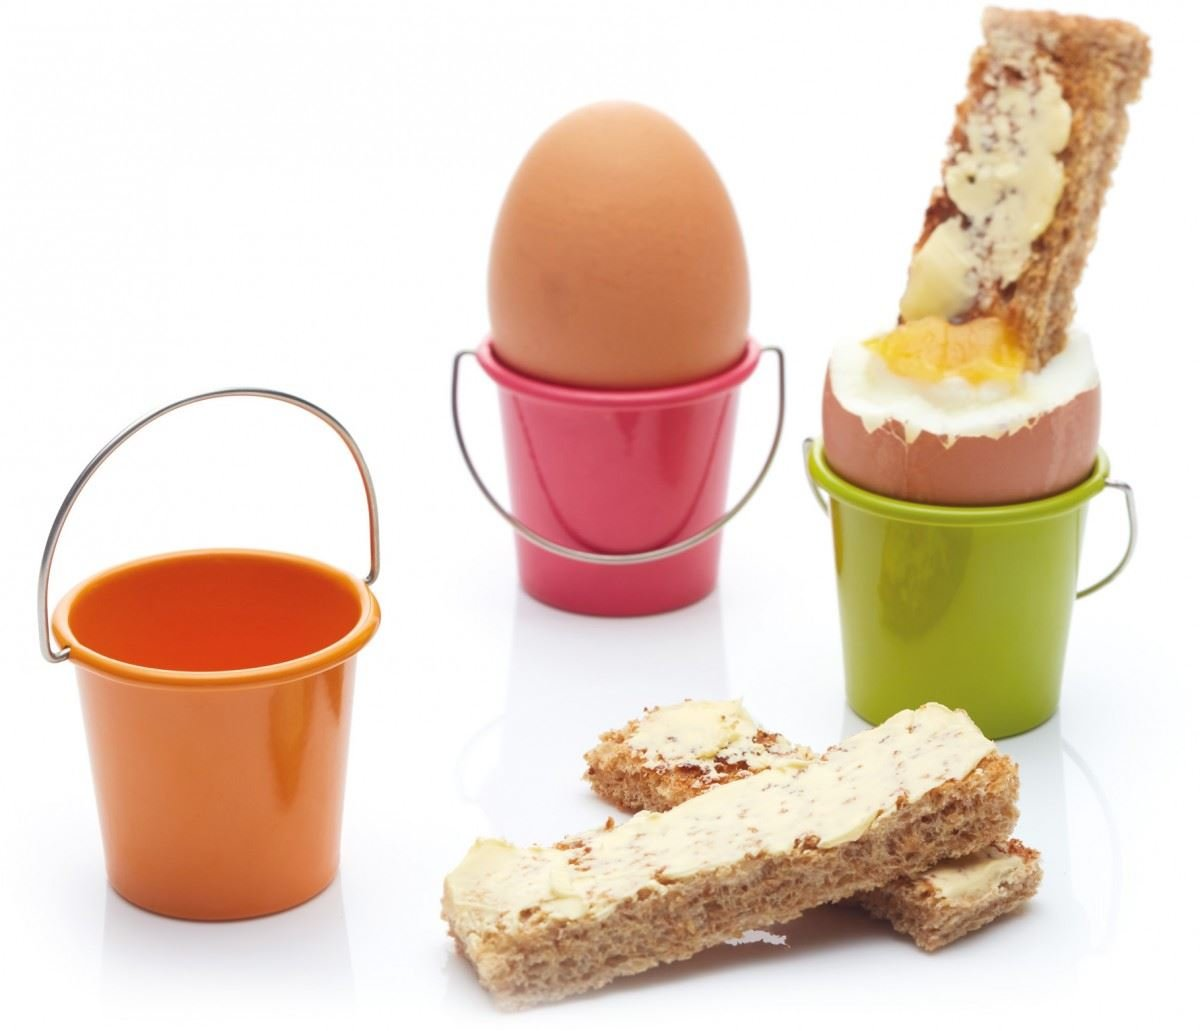 Colourworks Miniature Egg Buckets Egg Cup Set of 6 Multi-Coloured